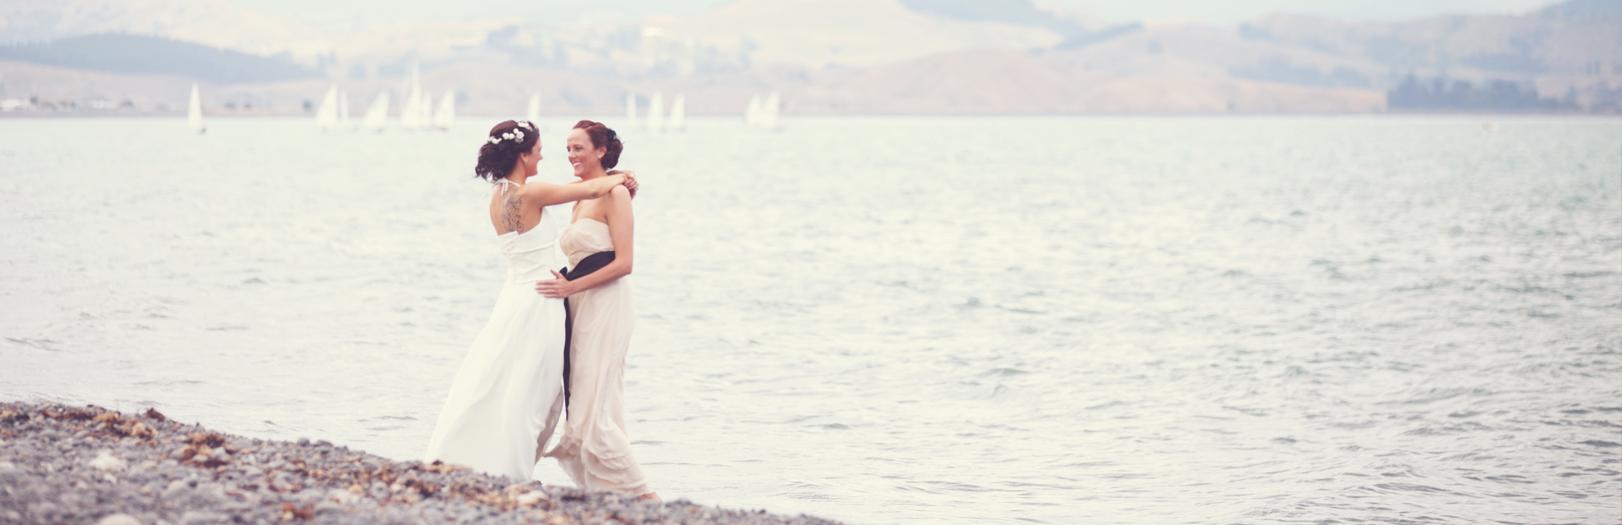 gay-wedding-photographers-nz